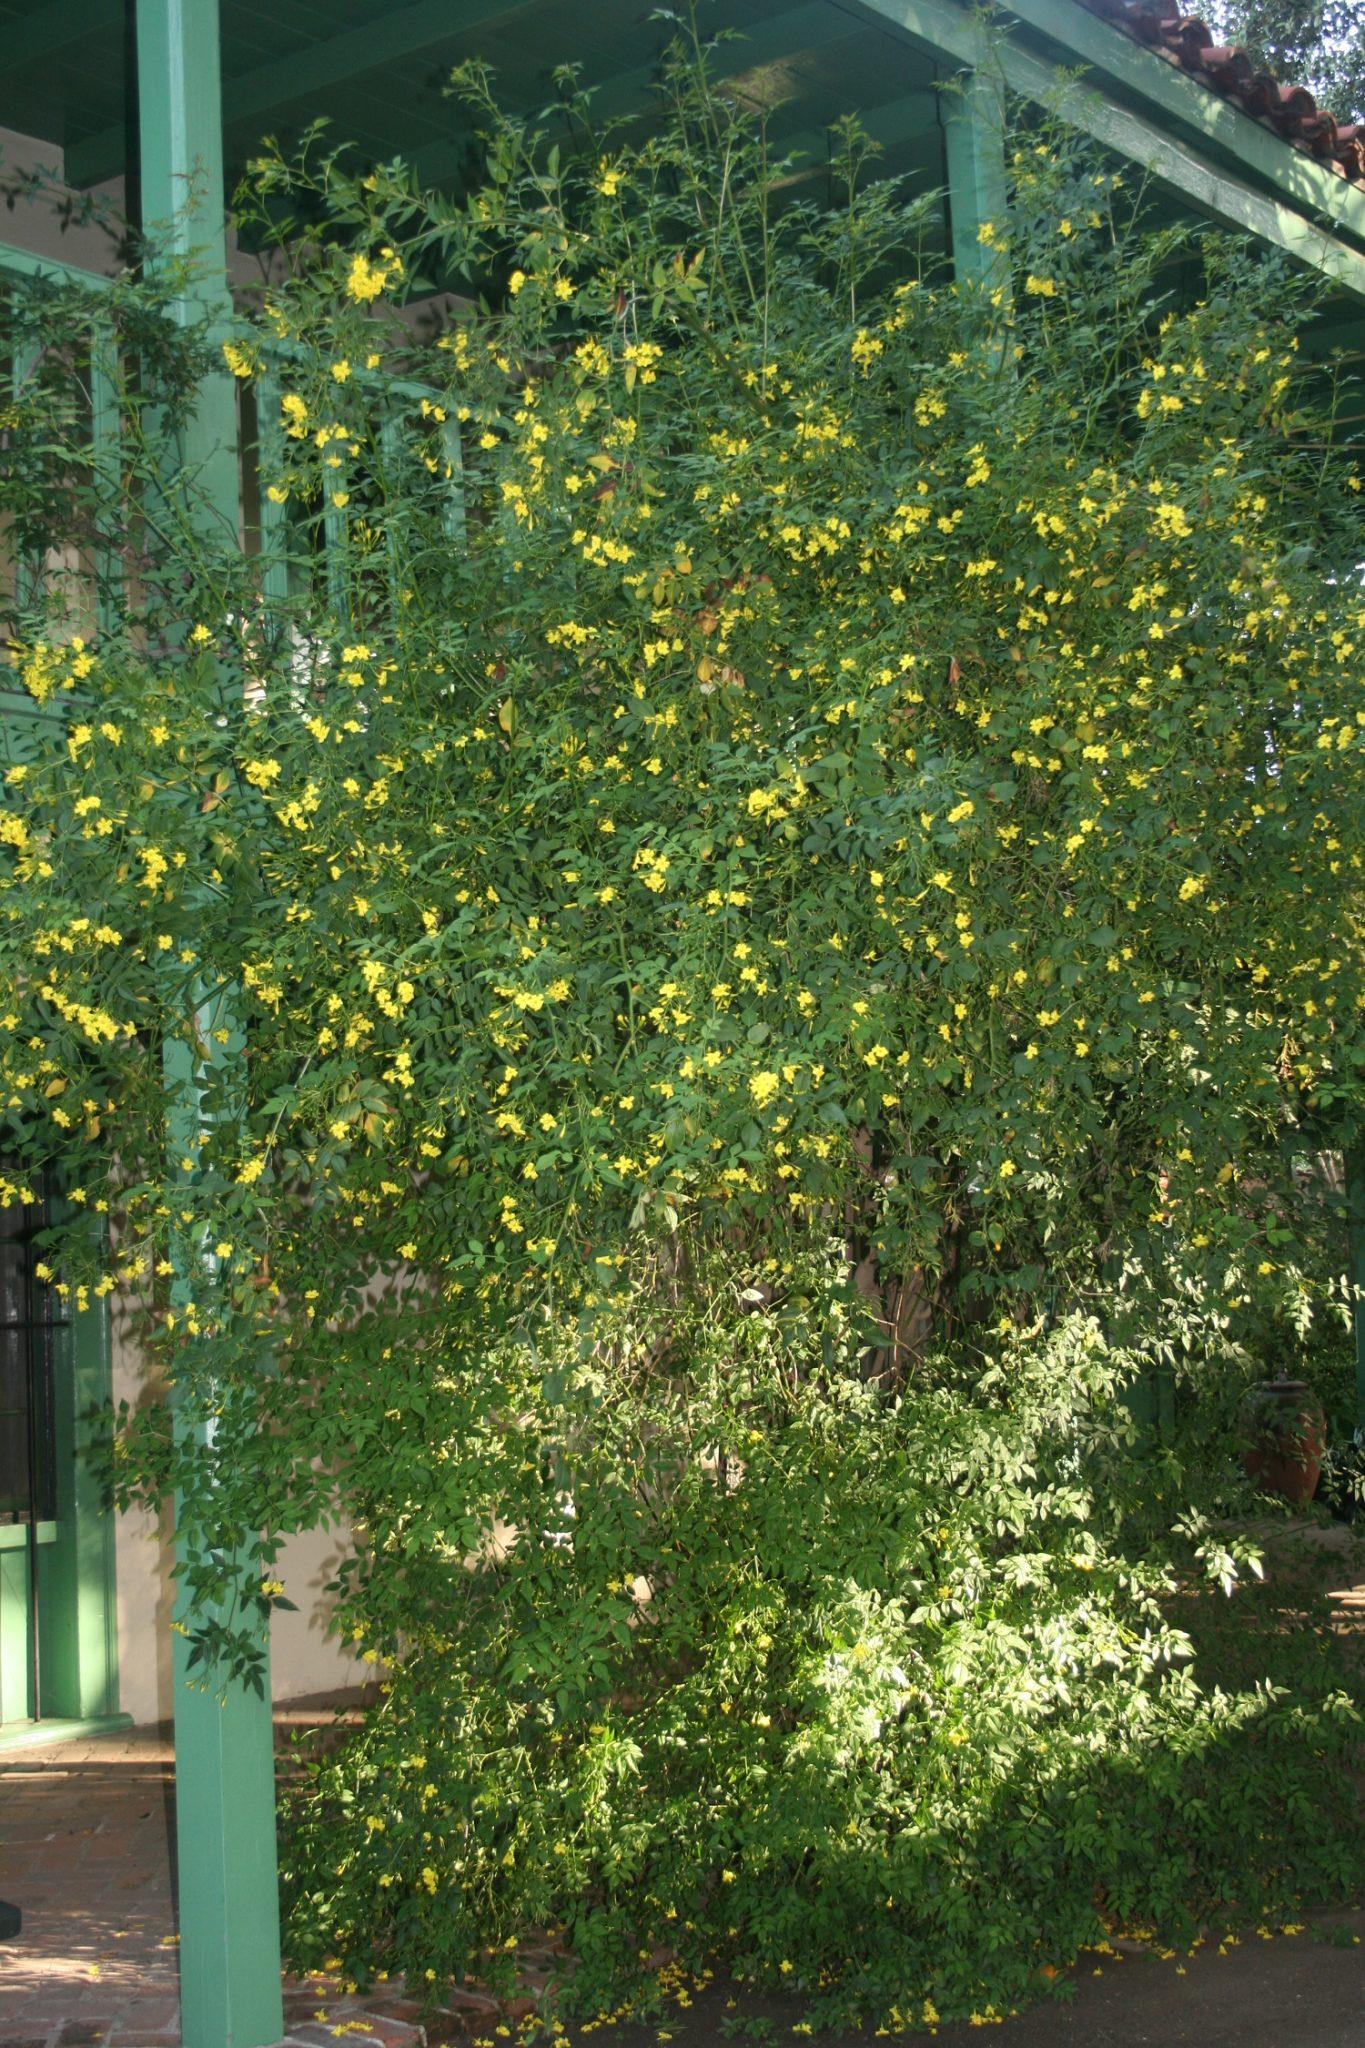 Jasmine – Jasminum mesnyi